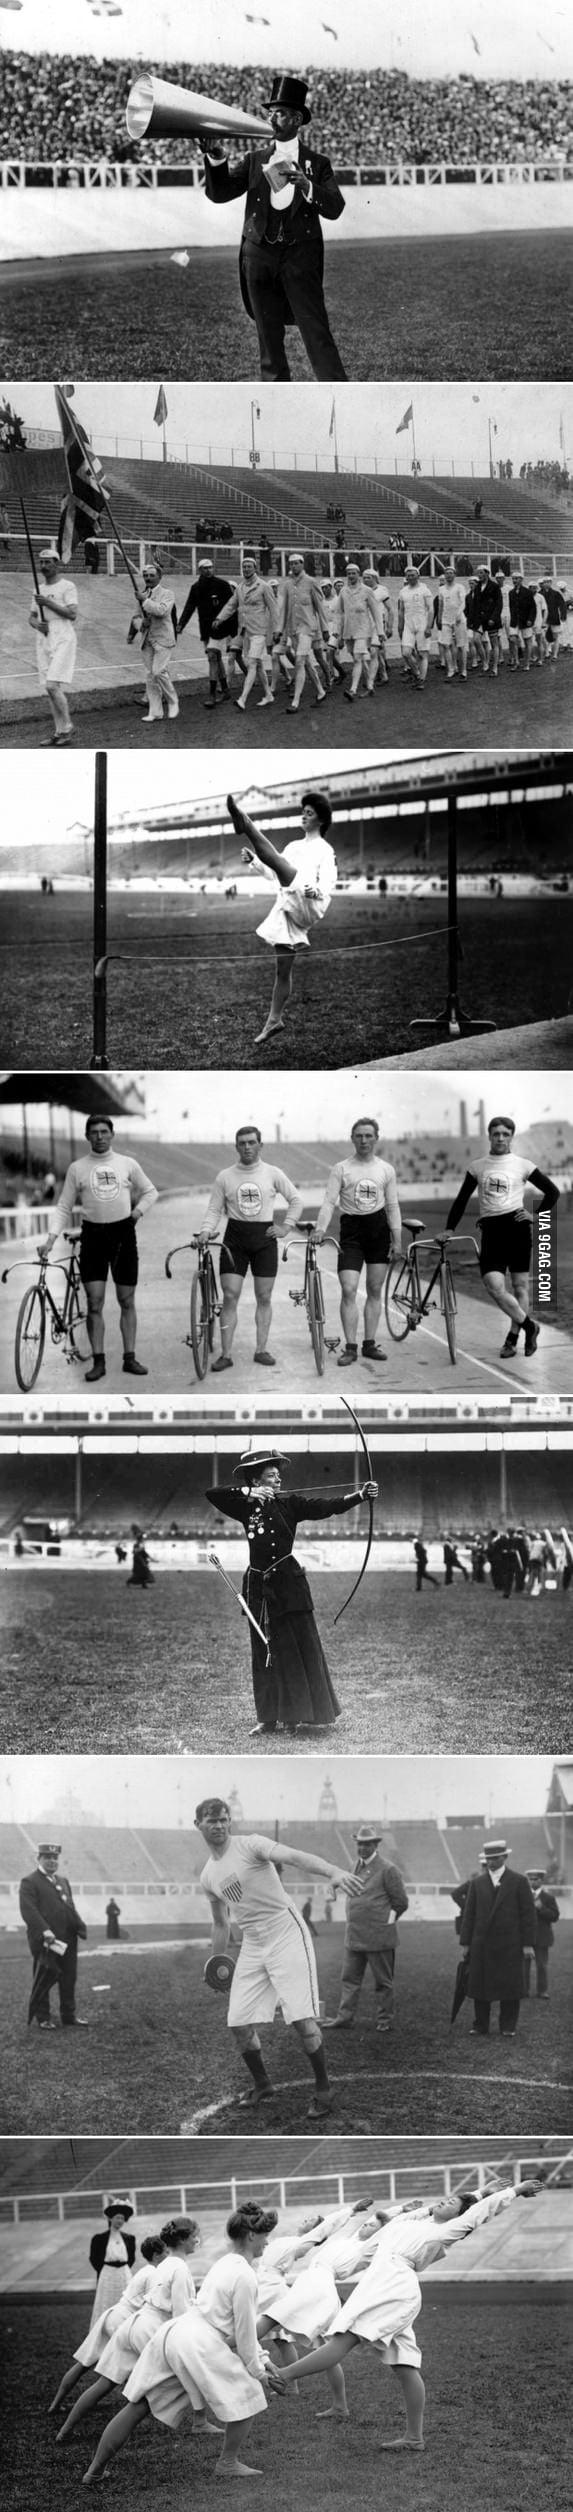 Olympics 1908